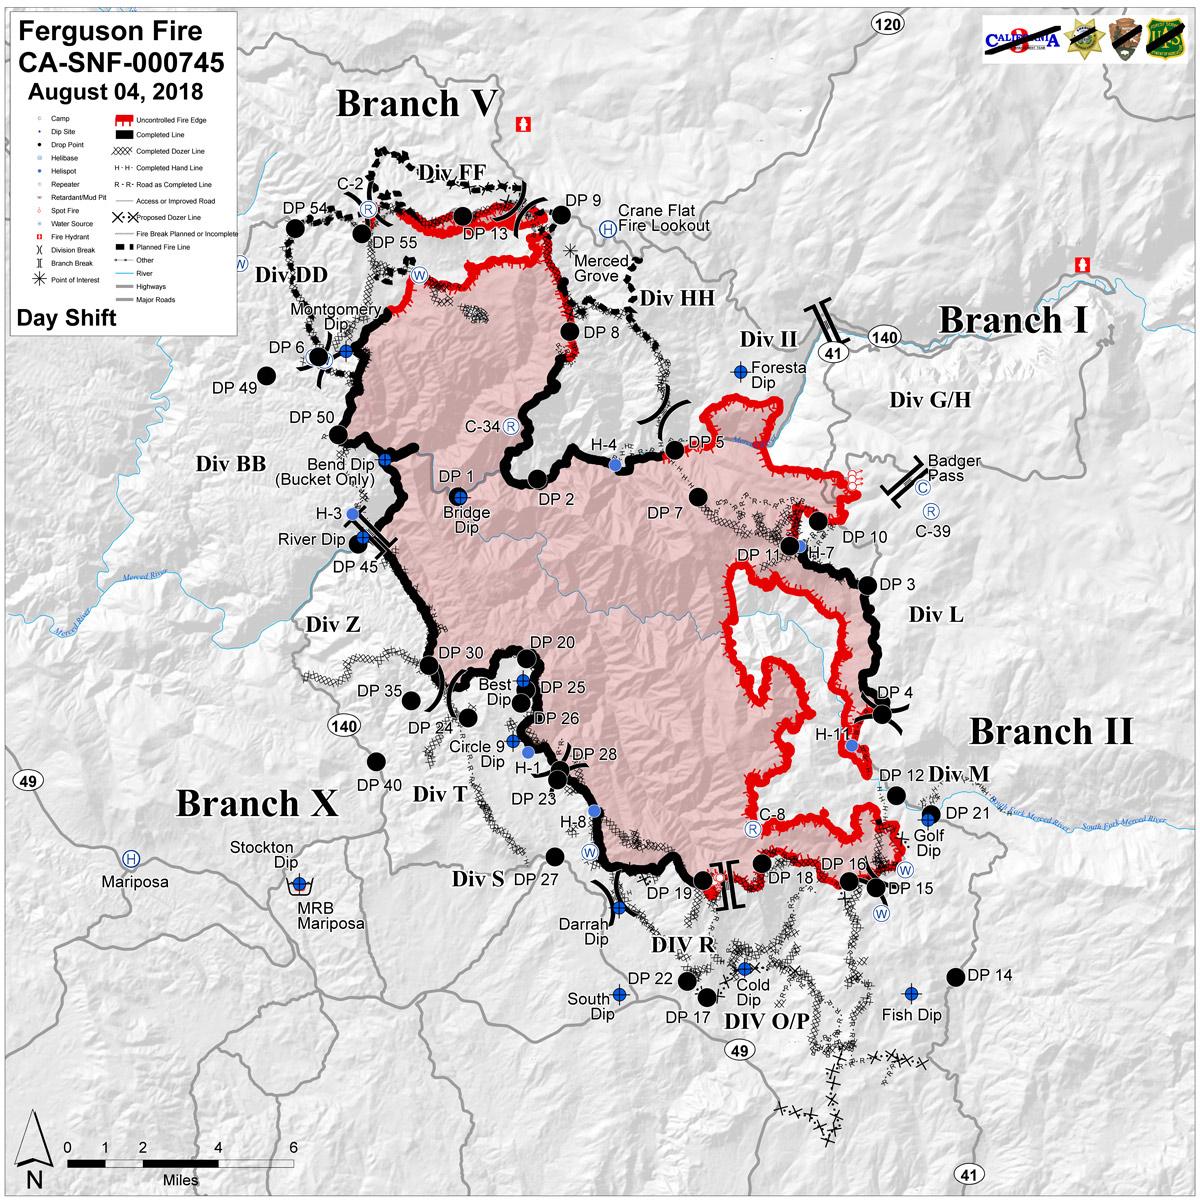 Ferguson Fire Near Yosemite National Park in Mariposa County ...